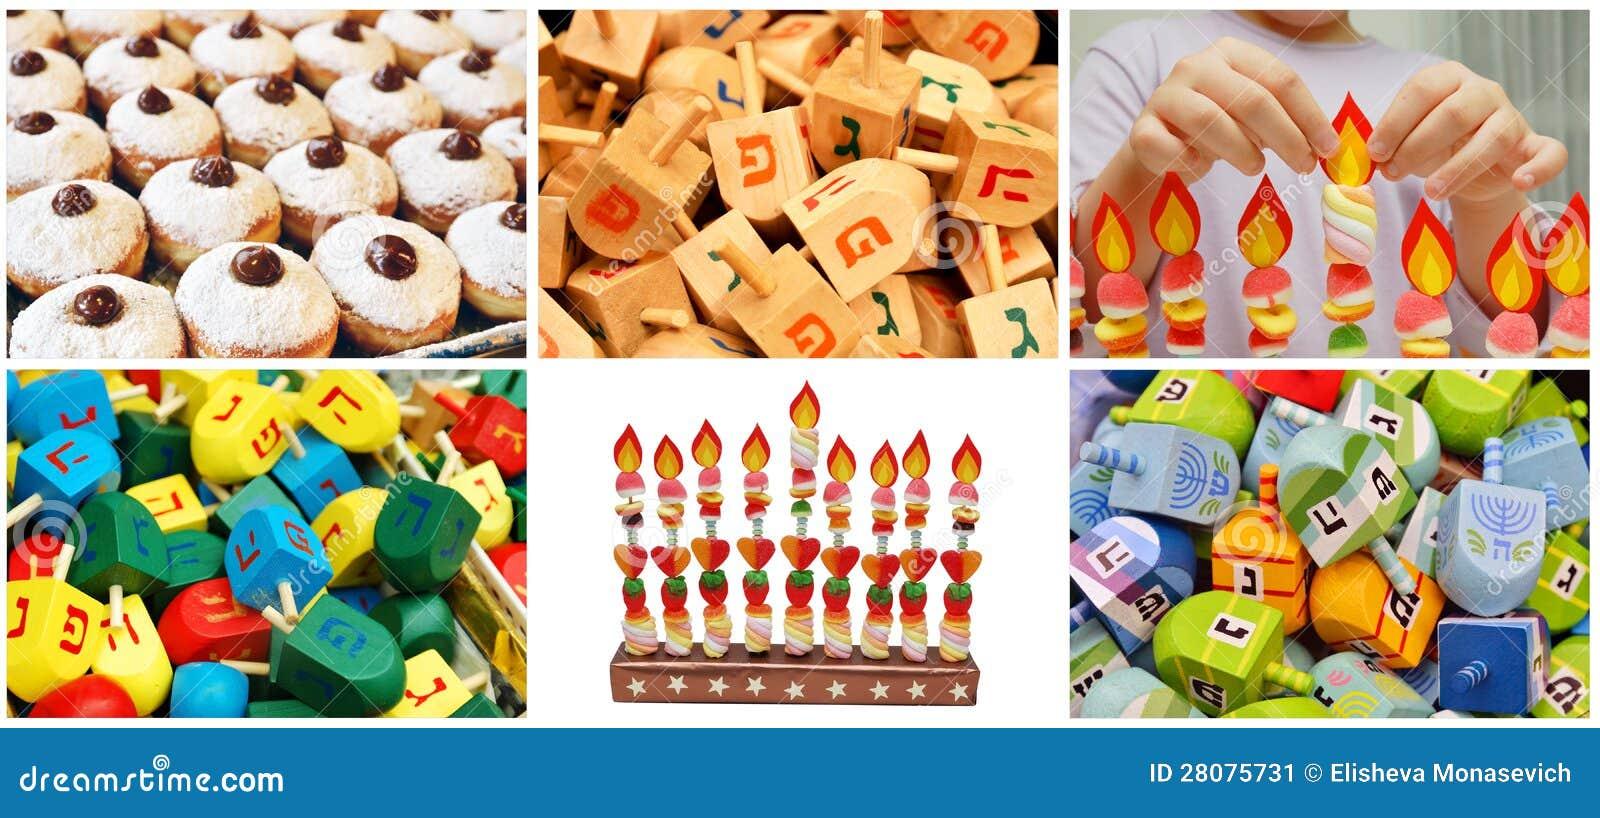 Collage judío de Jánuca hecho a partir de seis imágenes